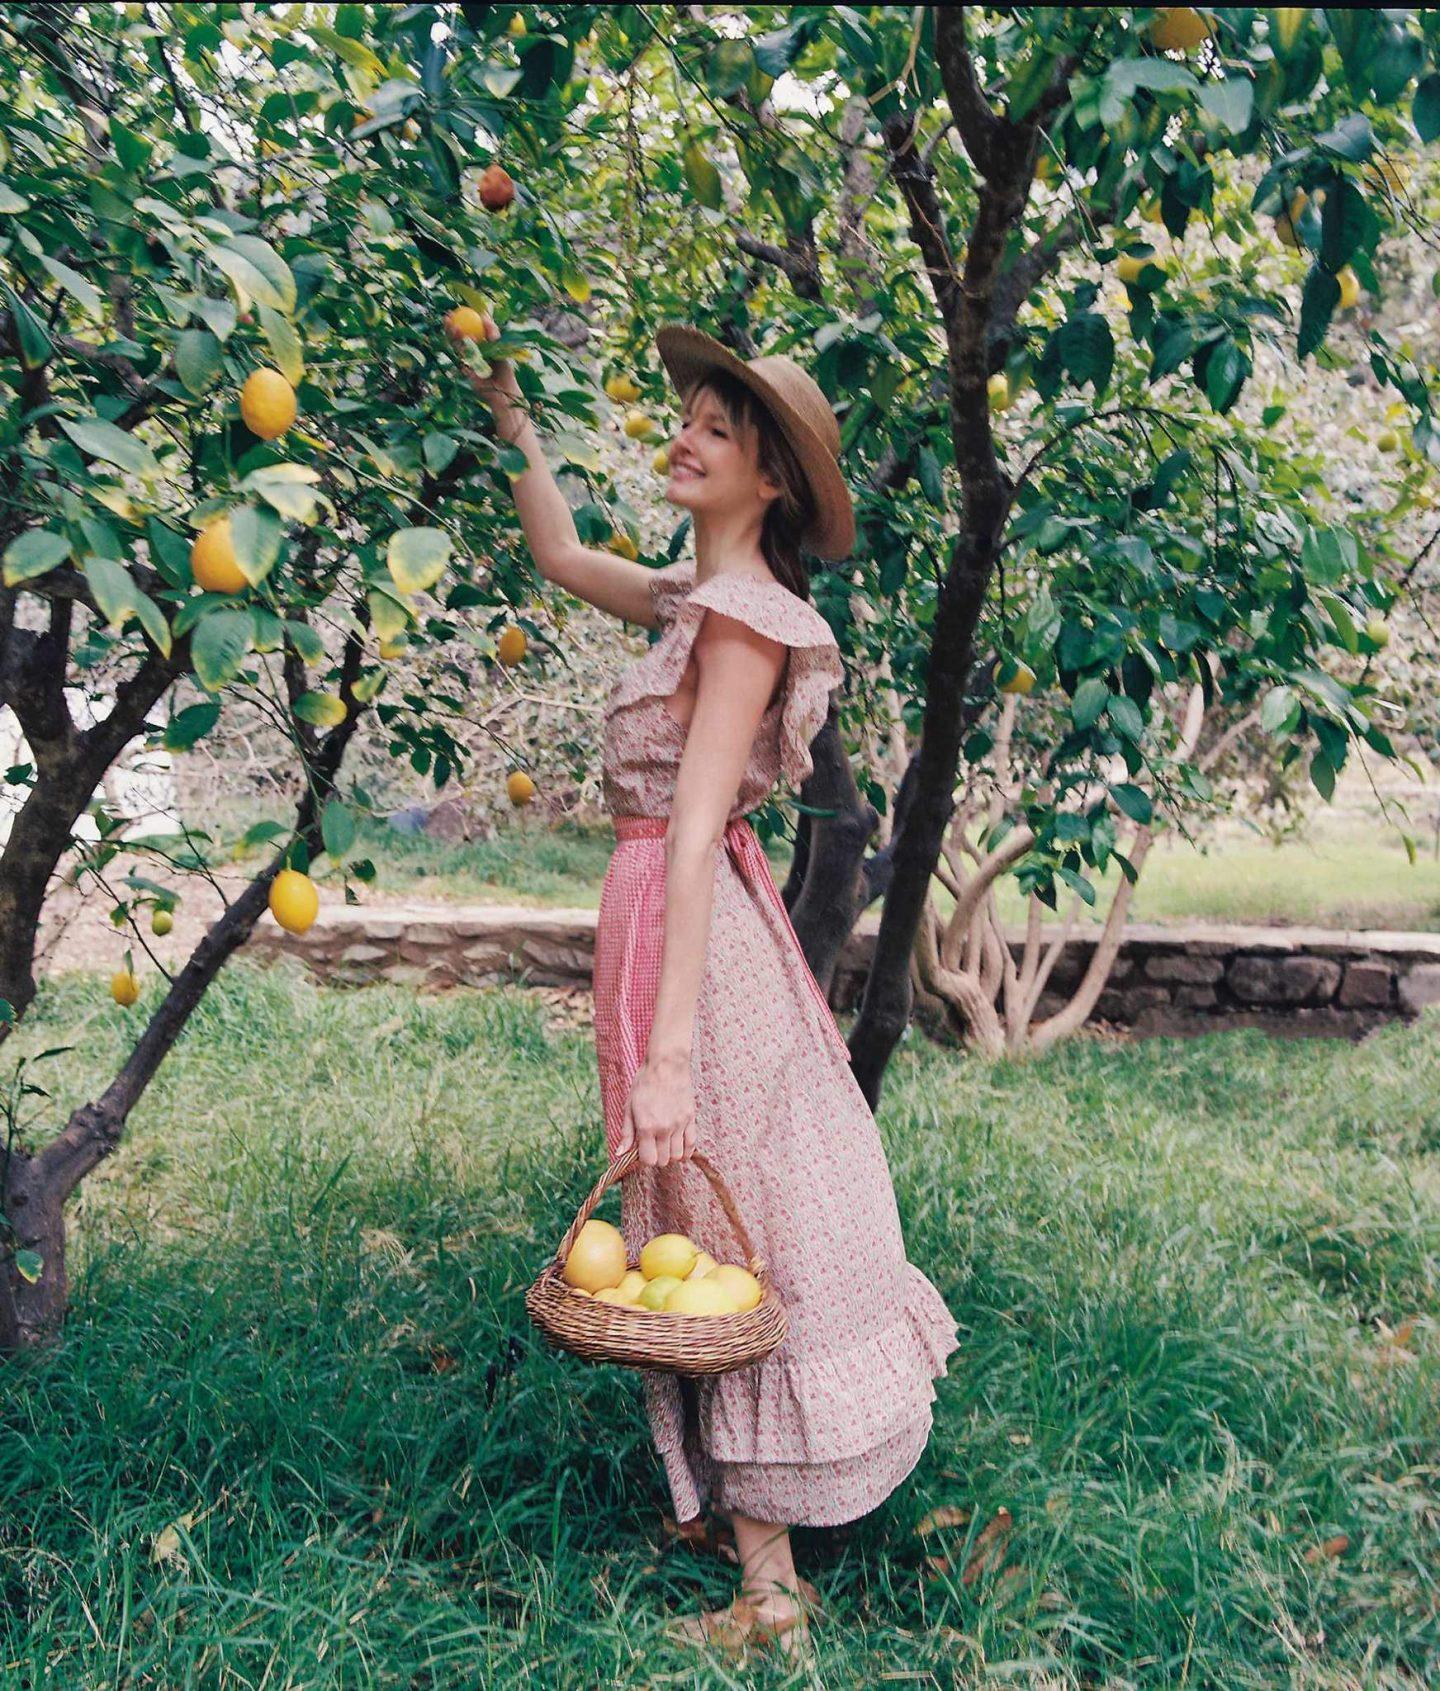 Pink vintage cottagecore dress